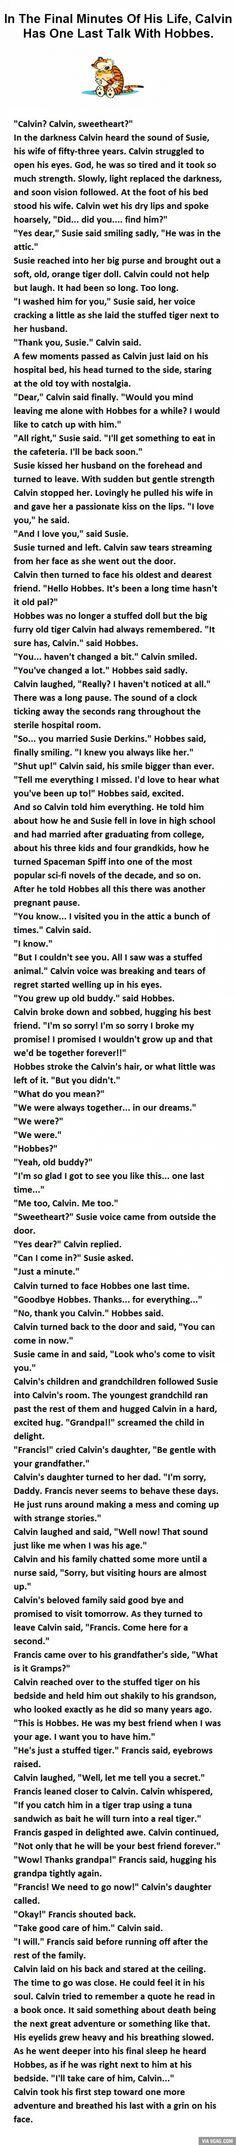 Calvin And Hobbes... It's Beautiful...